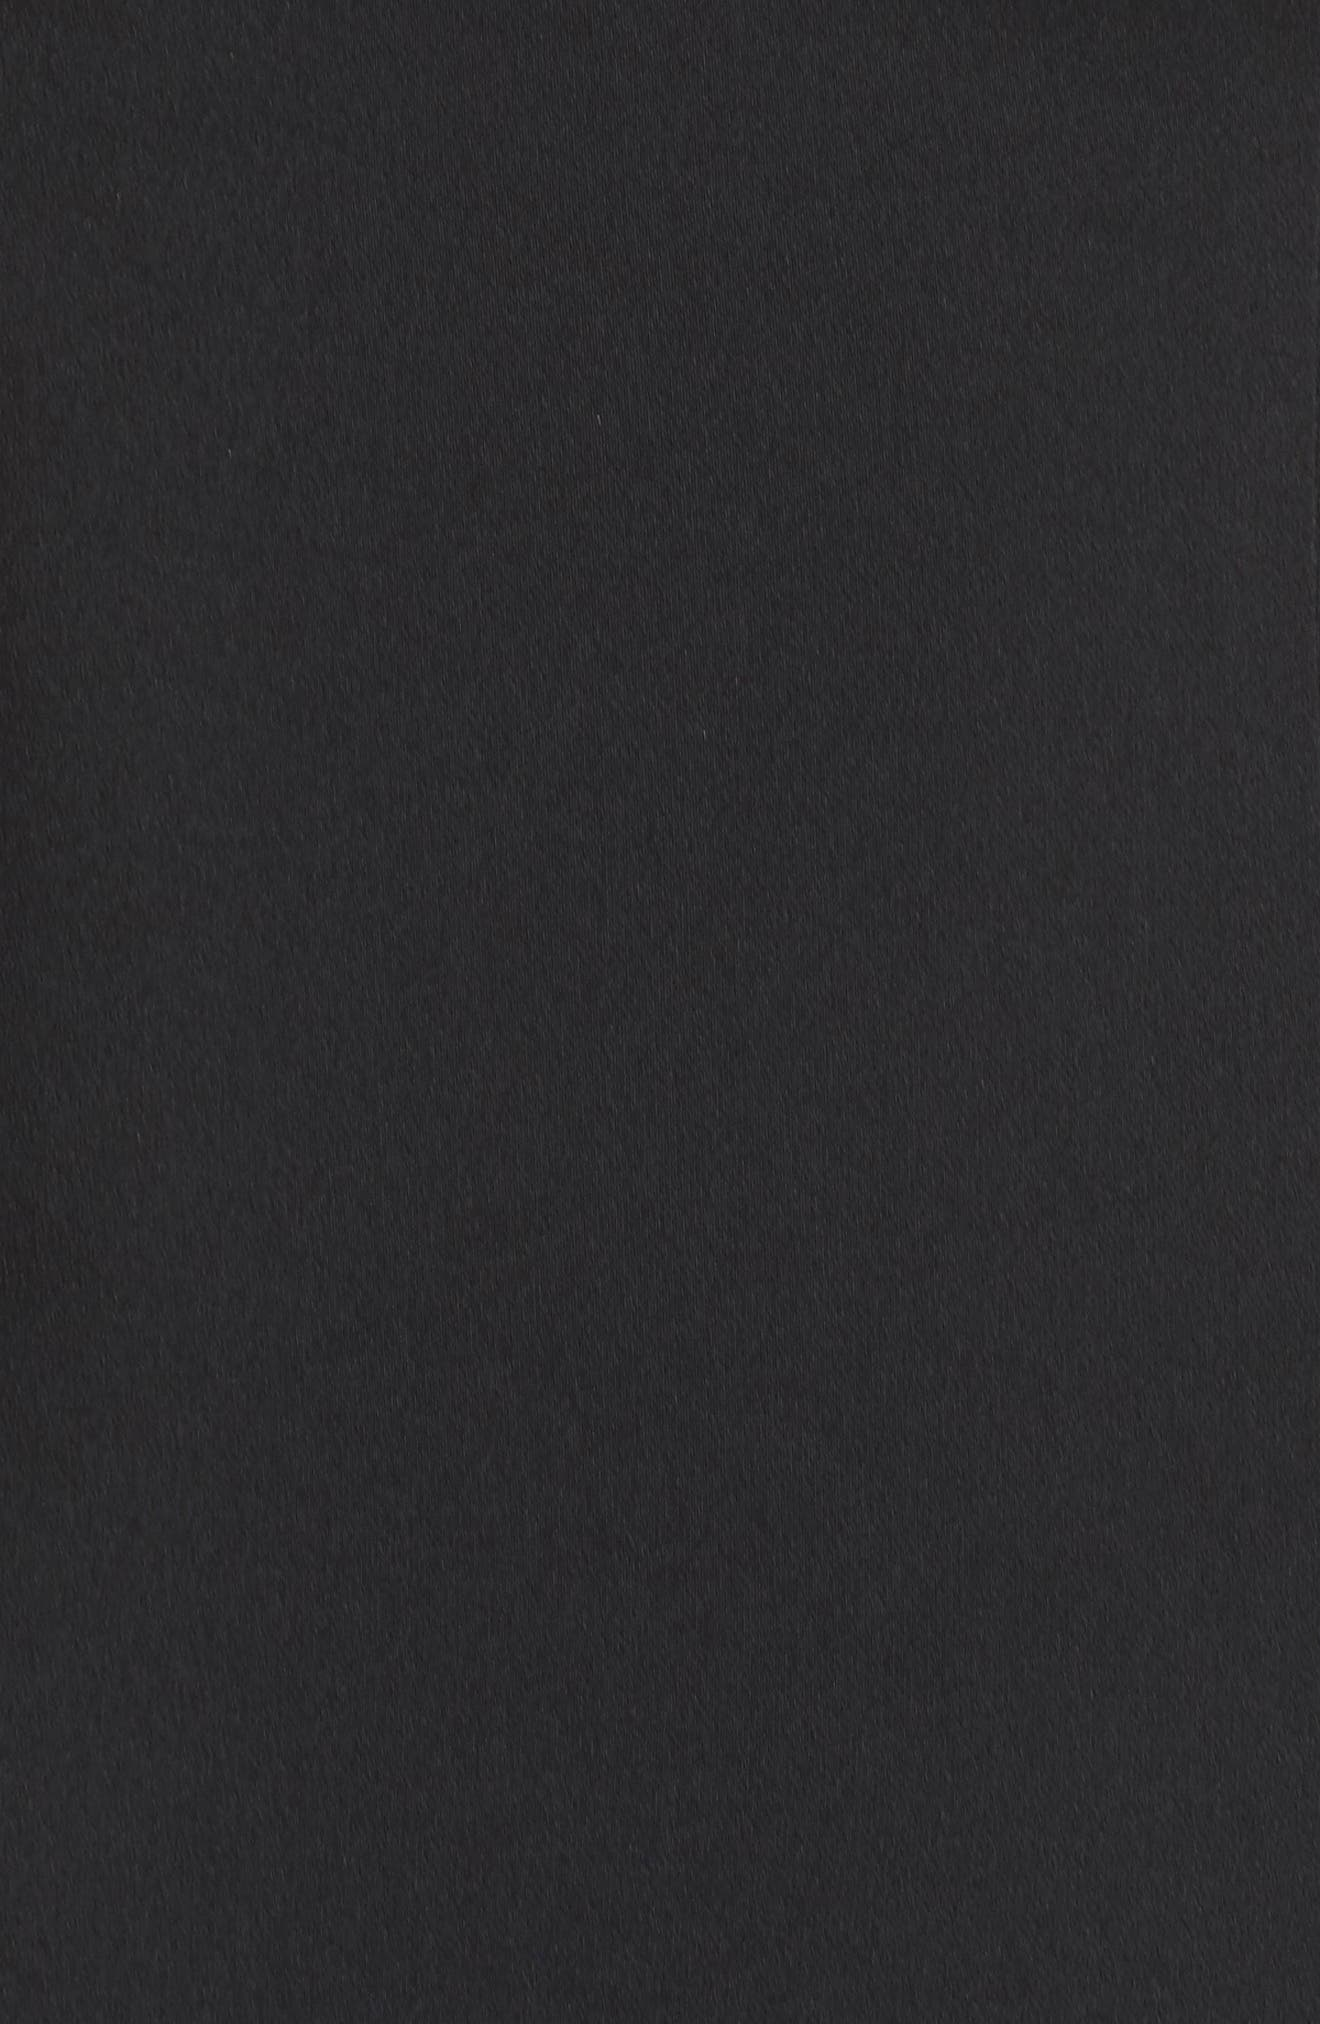 Kendra Elastic Strap Low Back Sheath Dress,                             Alternate thumbnail 5, color,                             Black